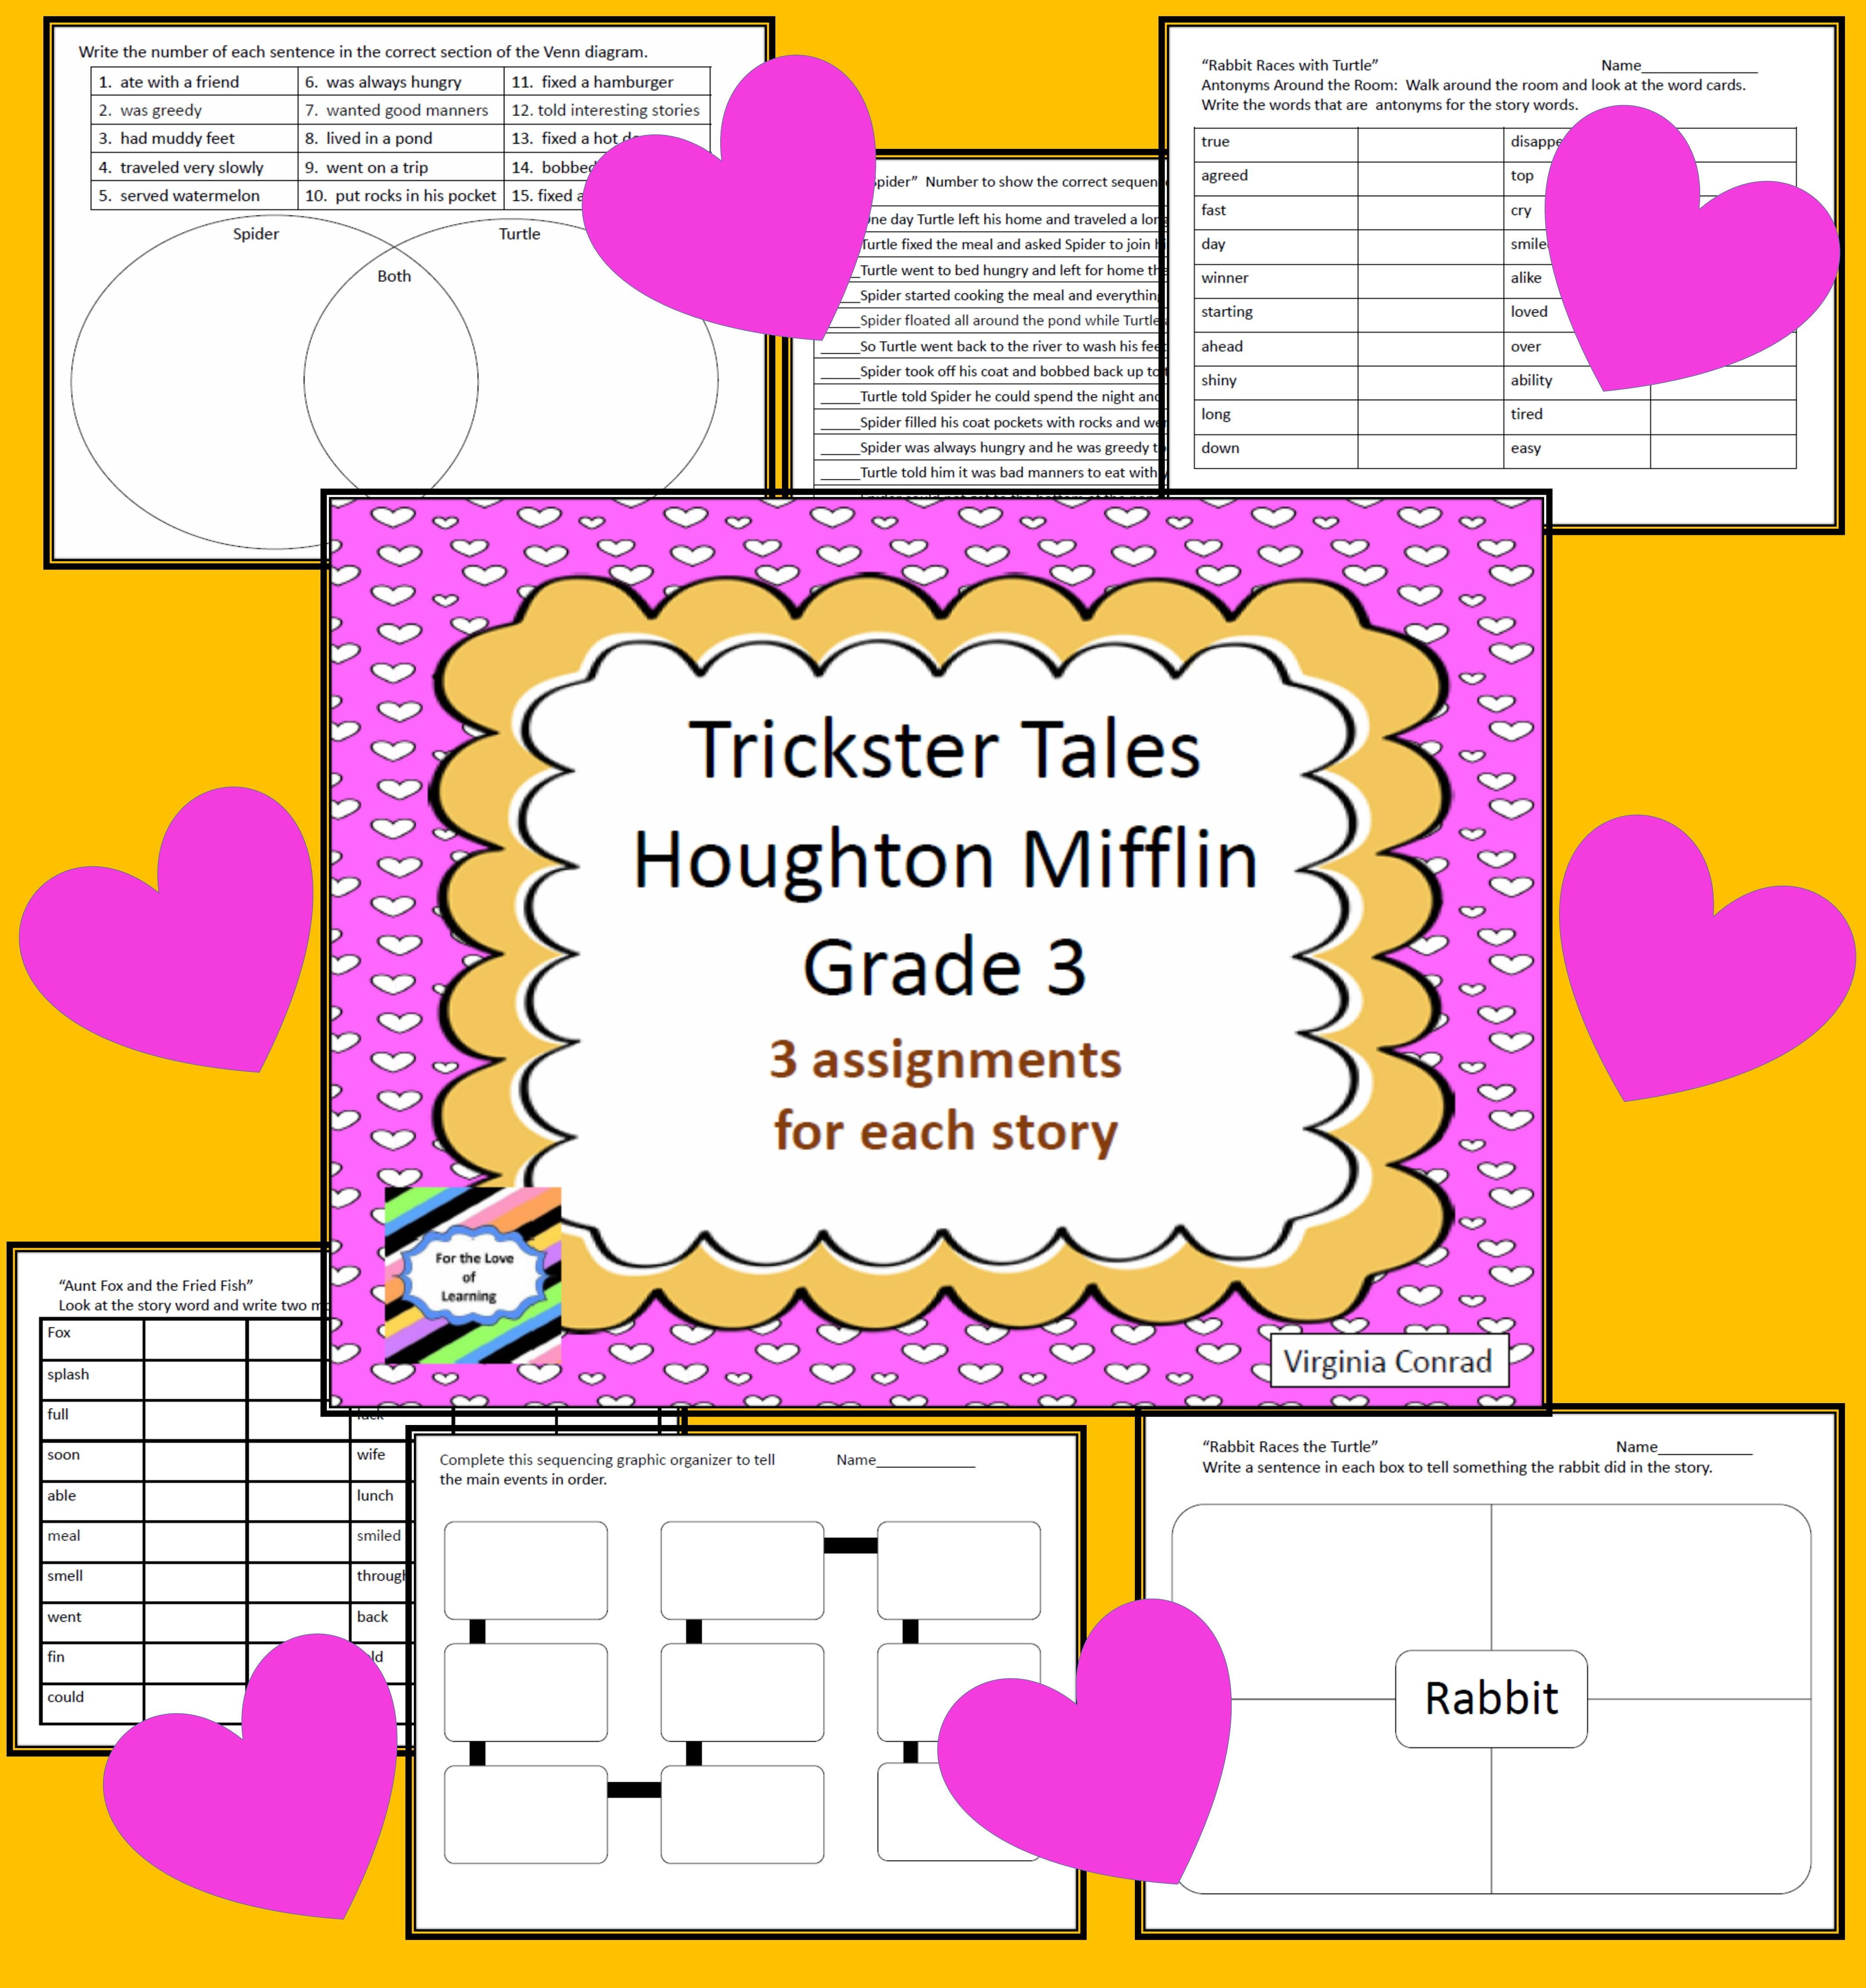 Trickster Tales 9 Activities Houghton Mifflin Grade 3